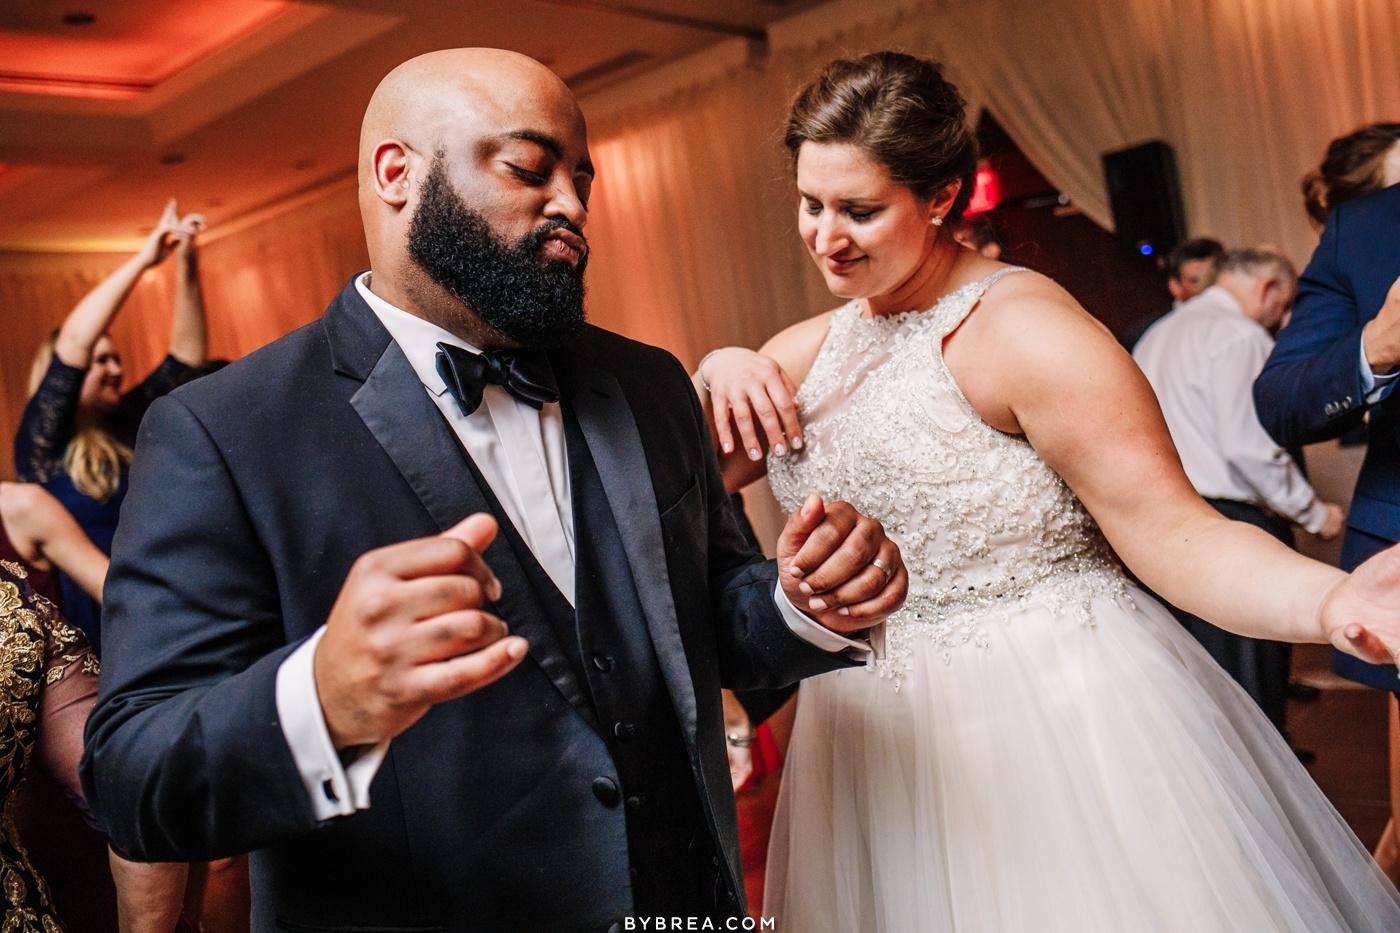 Reception photo of bride and groom dancing at Park Hyatt D.C.